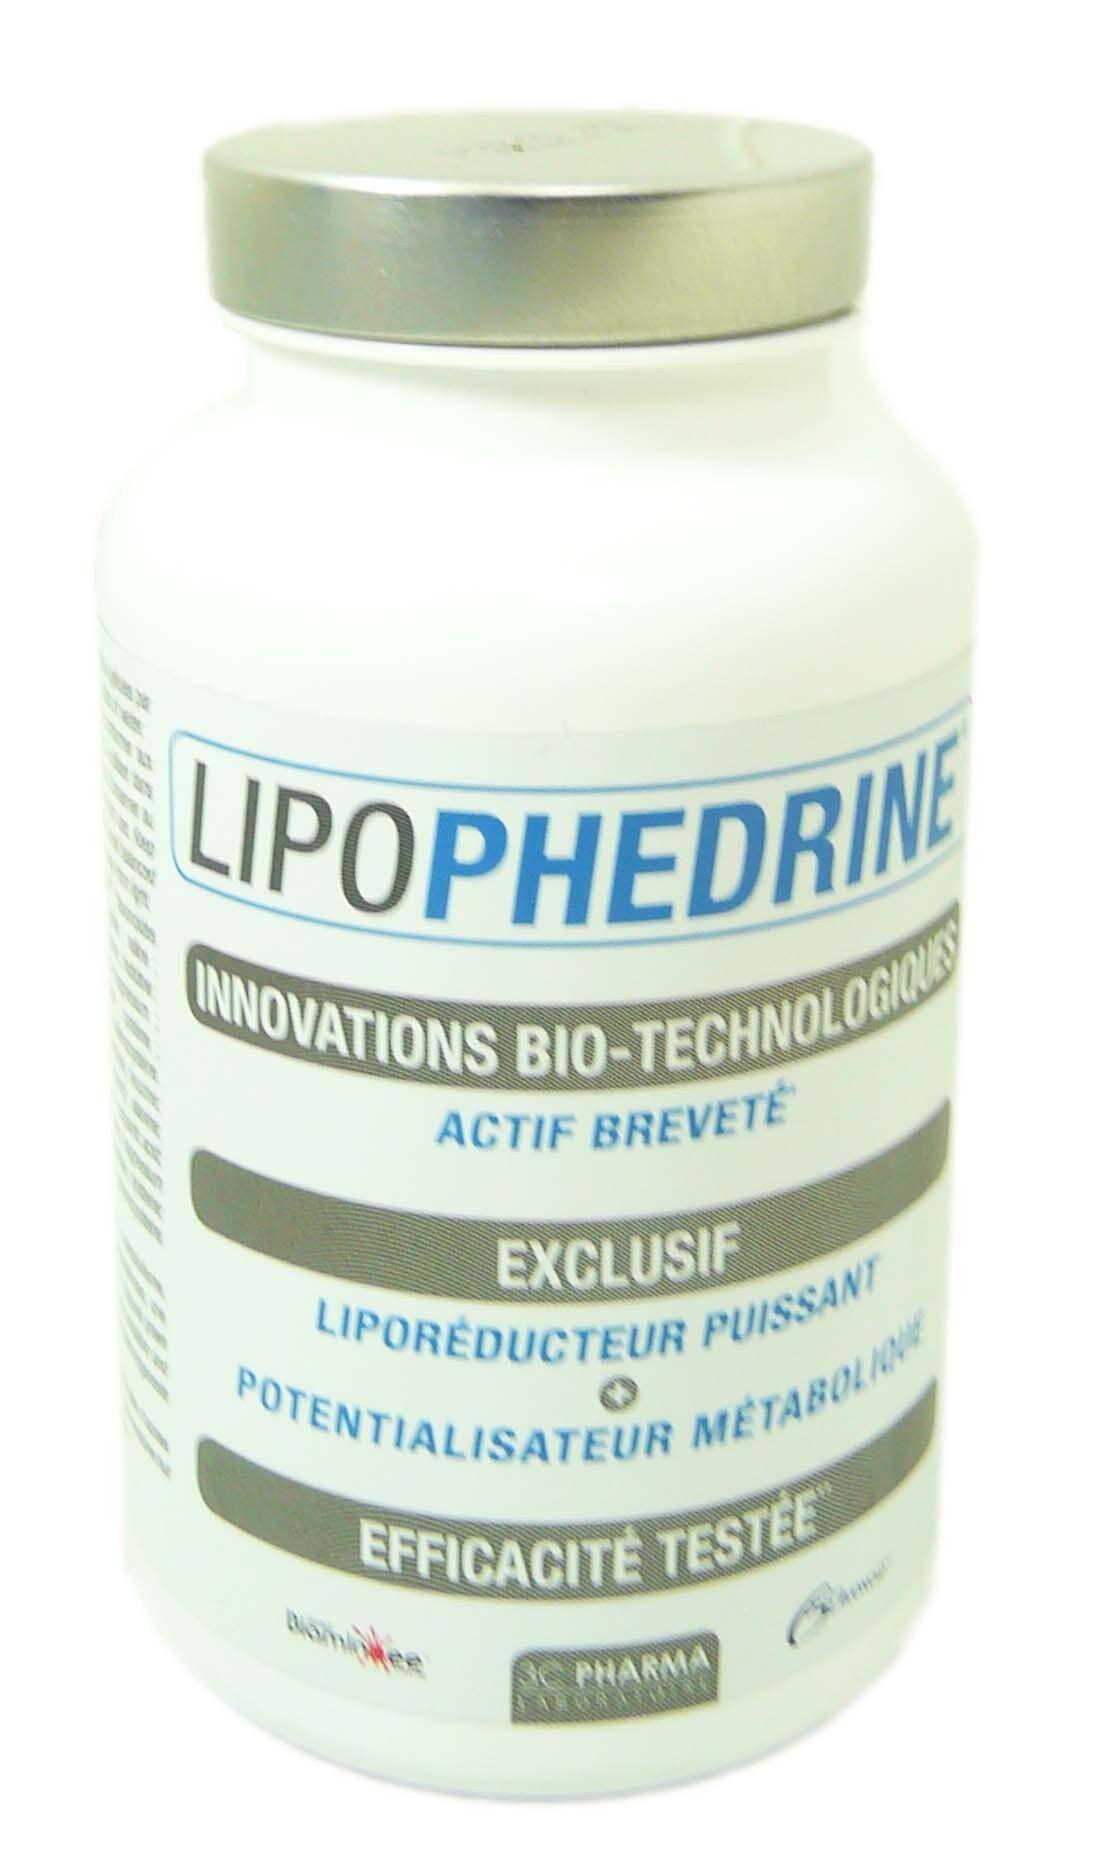 3C PHARMA Lipophedrine liporeducteur puissant 80 gelules